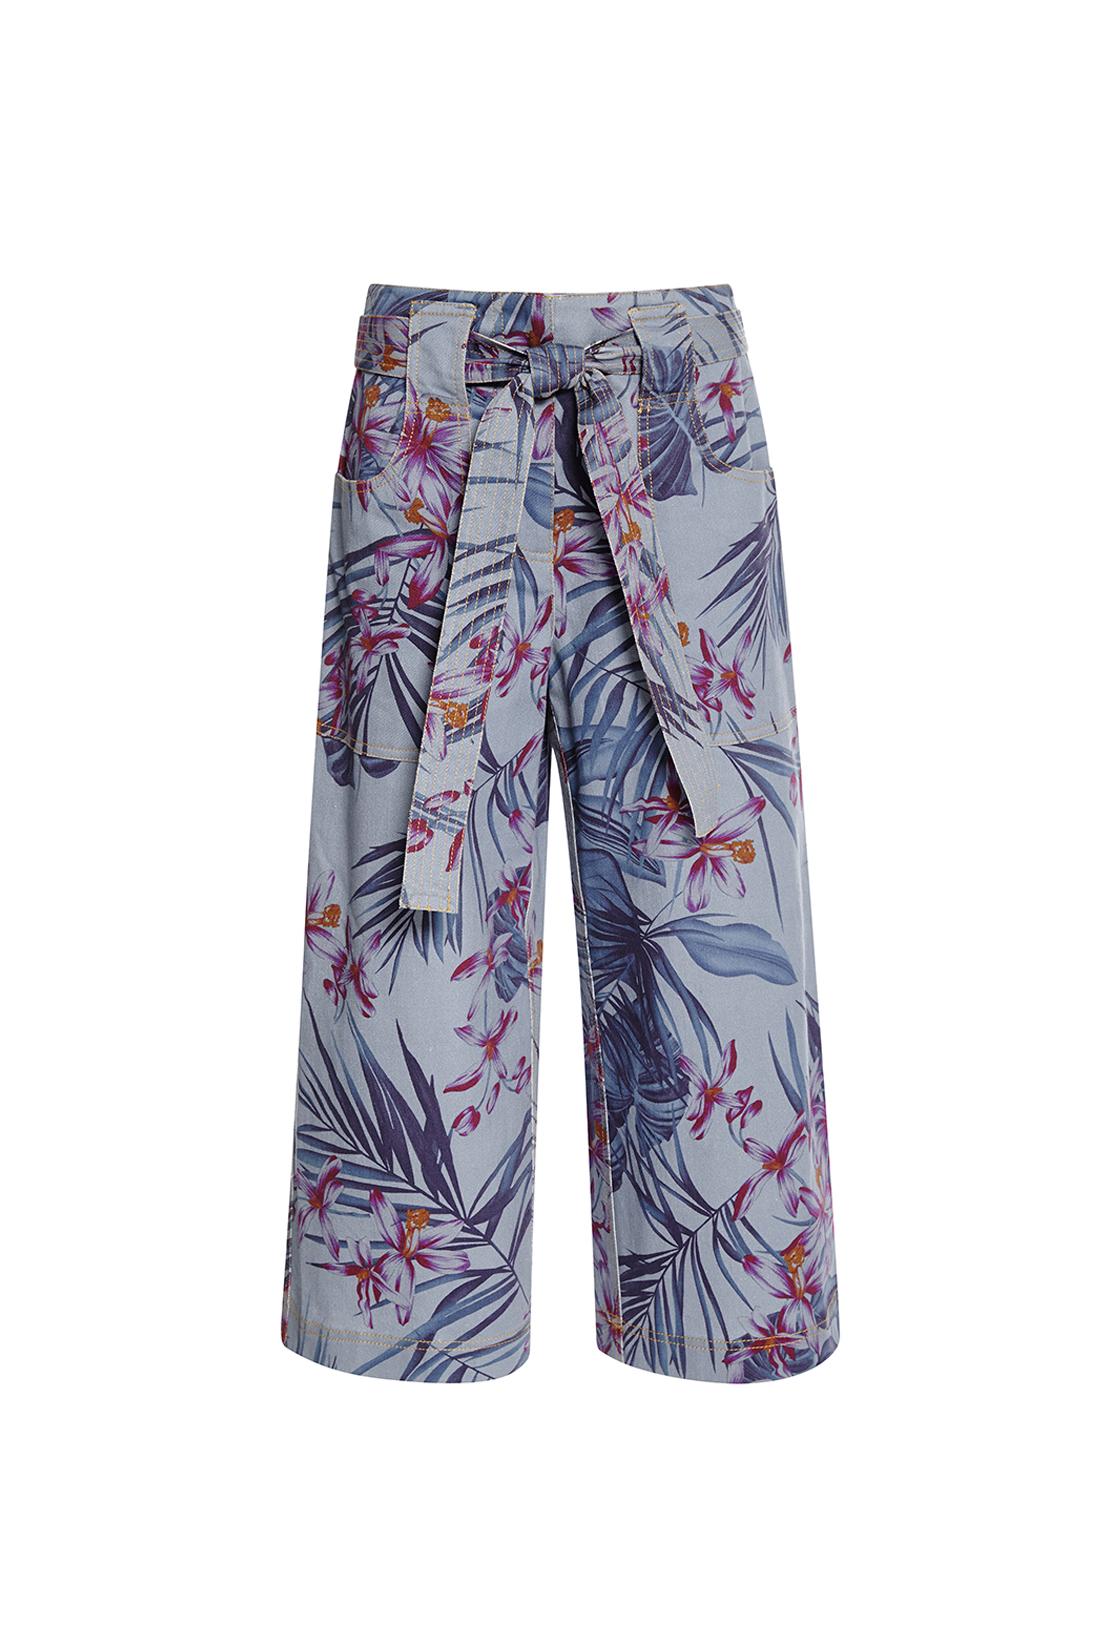 02-spring-denim-trends-culottes-05.jpg